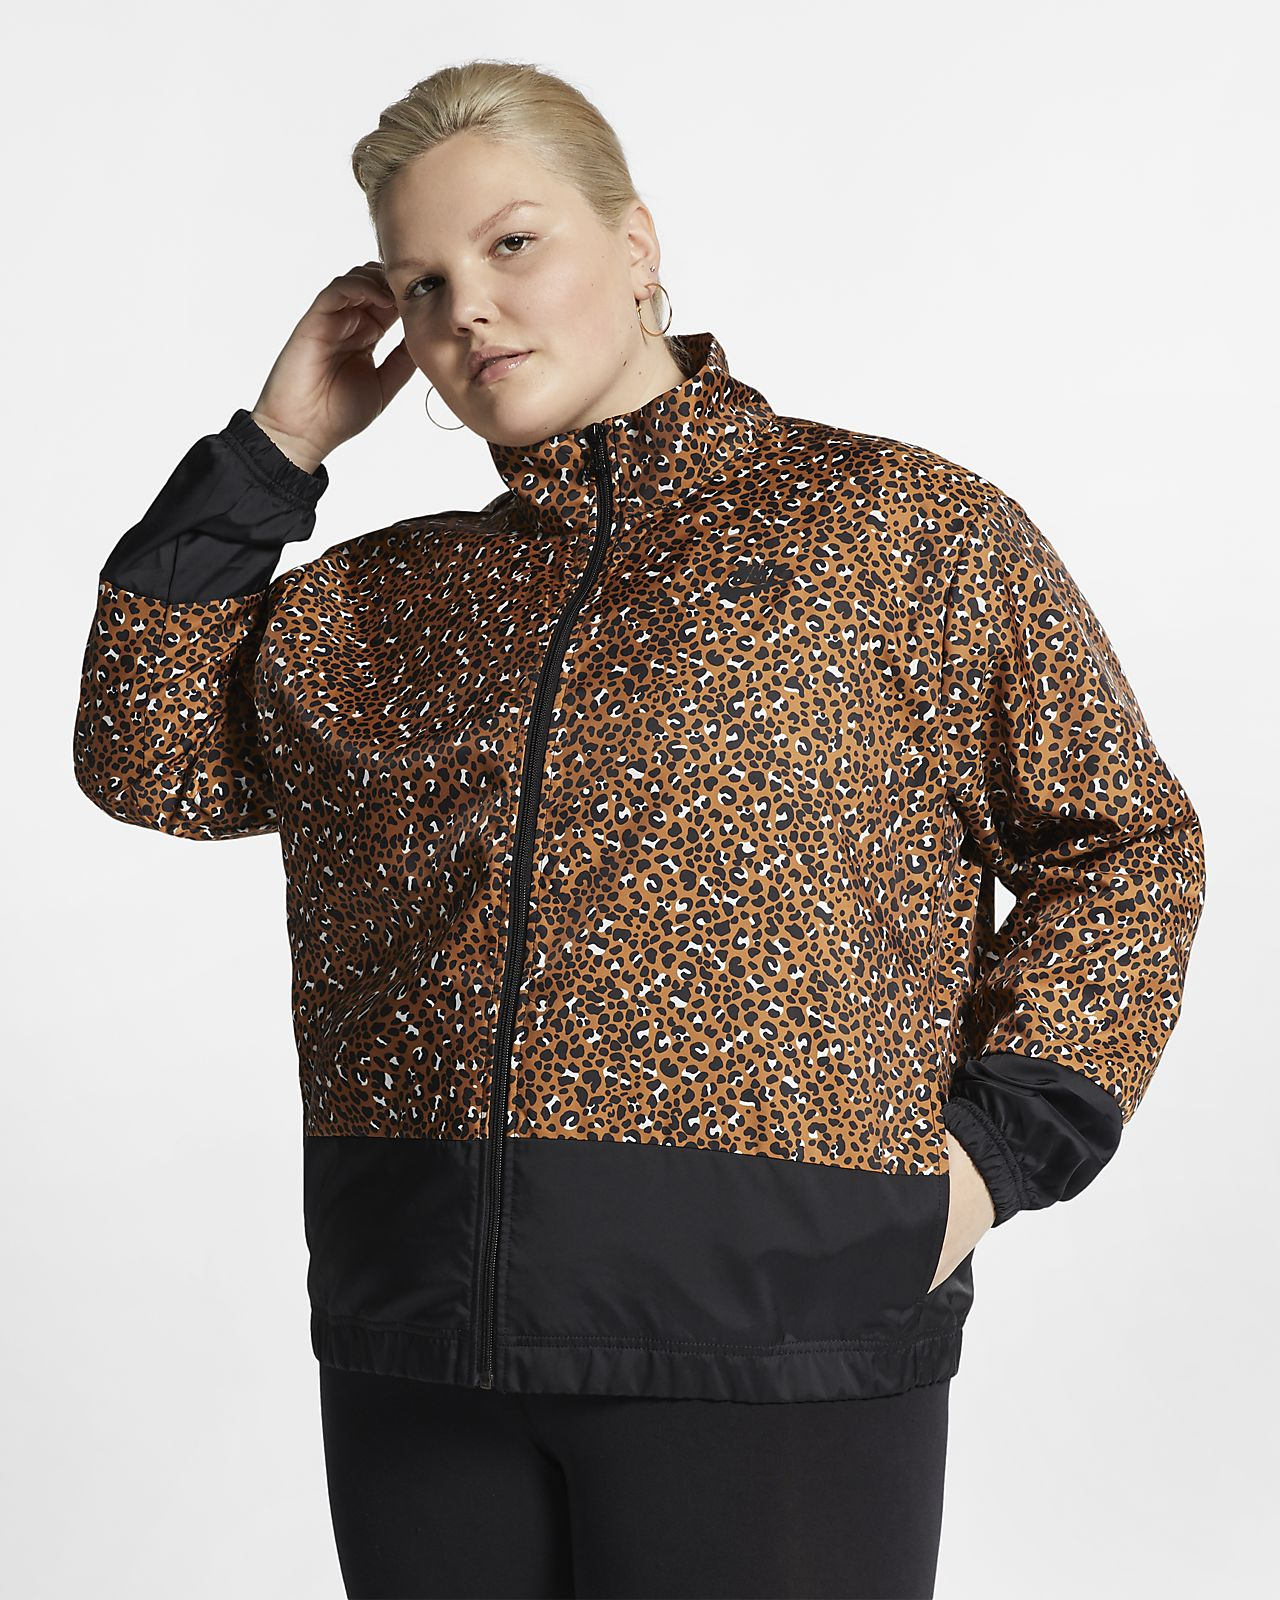 Veste tissée Nike Sportswear Animal Print pour Femme (grande taille)